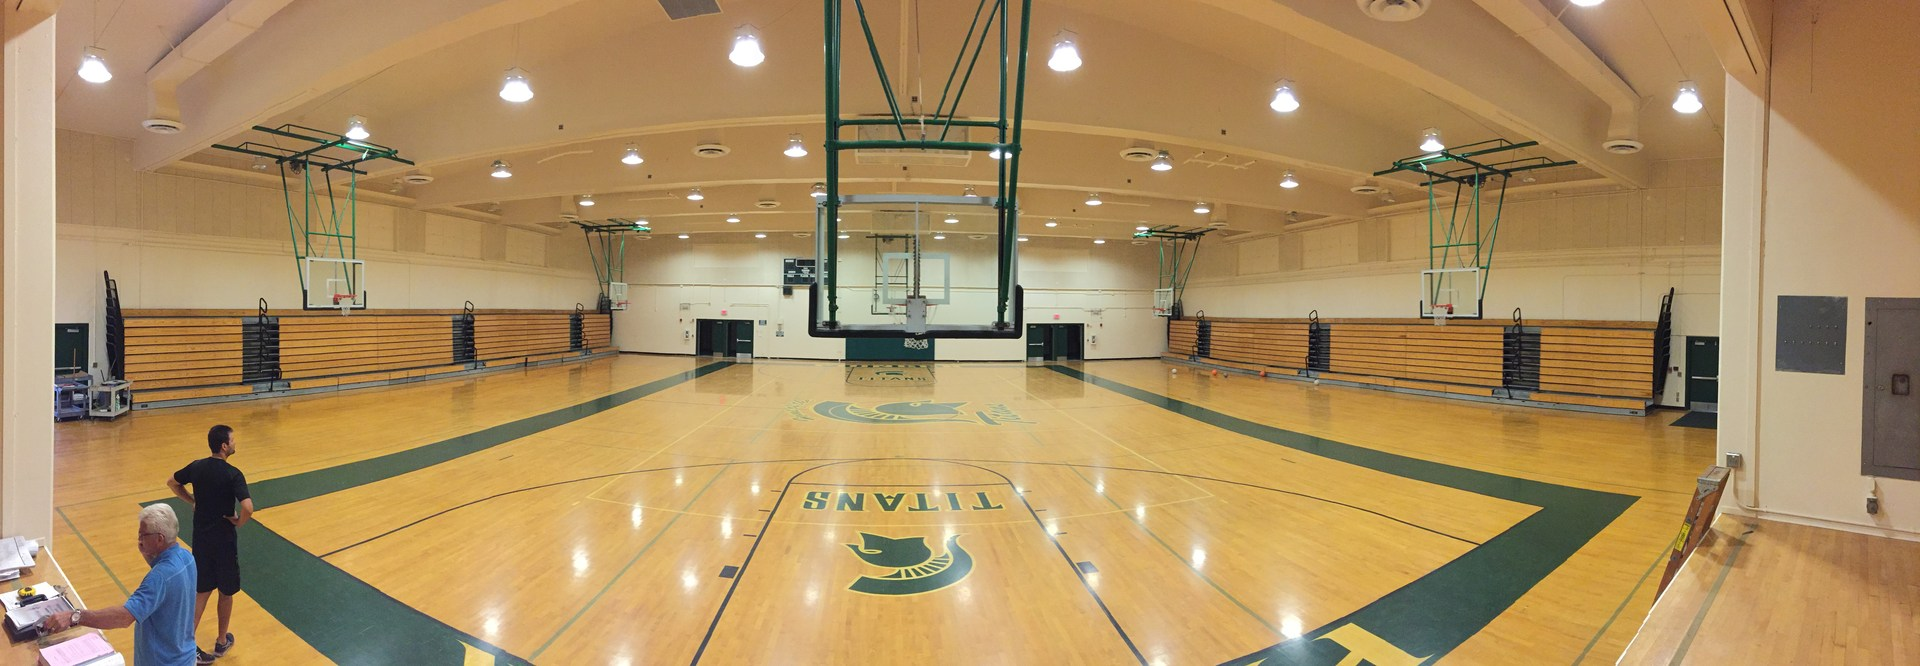 PHS Gymnasium